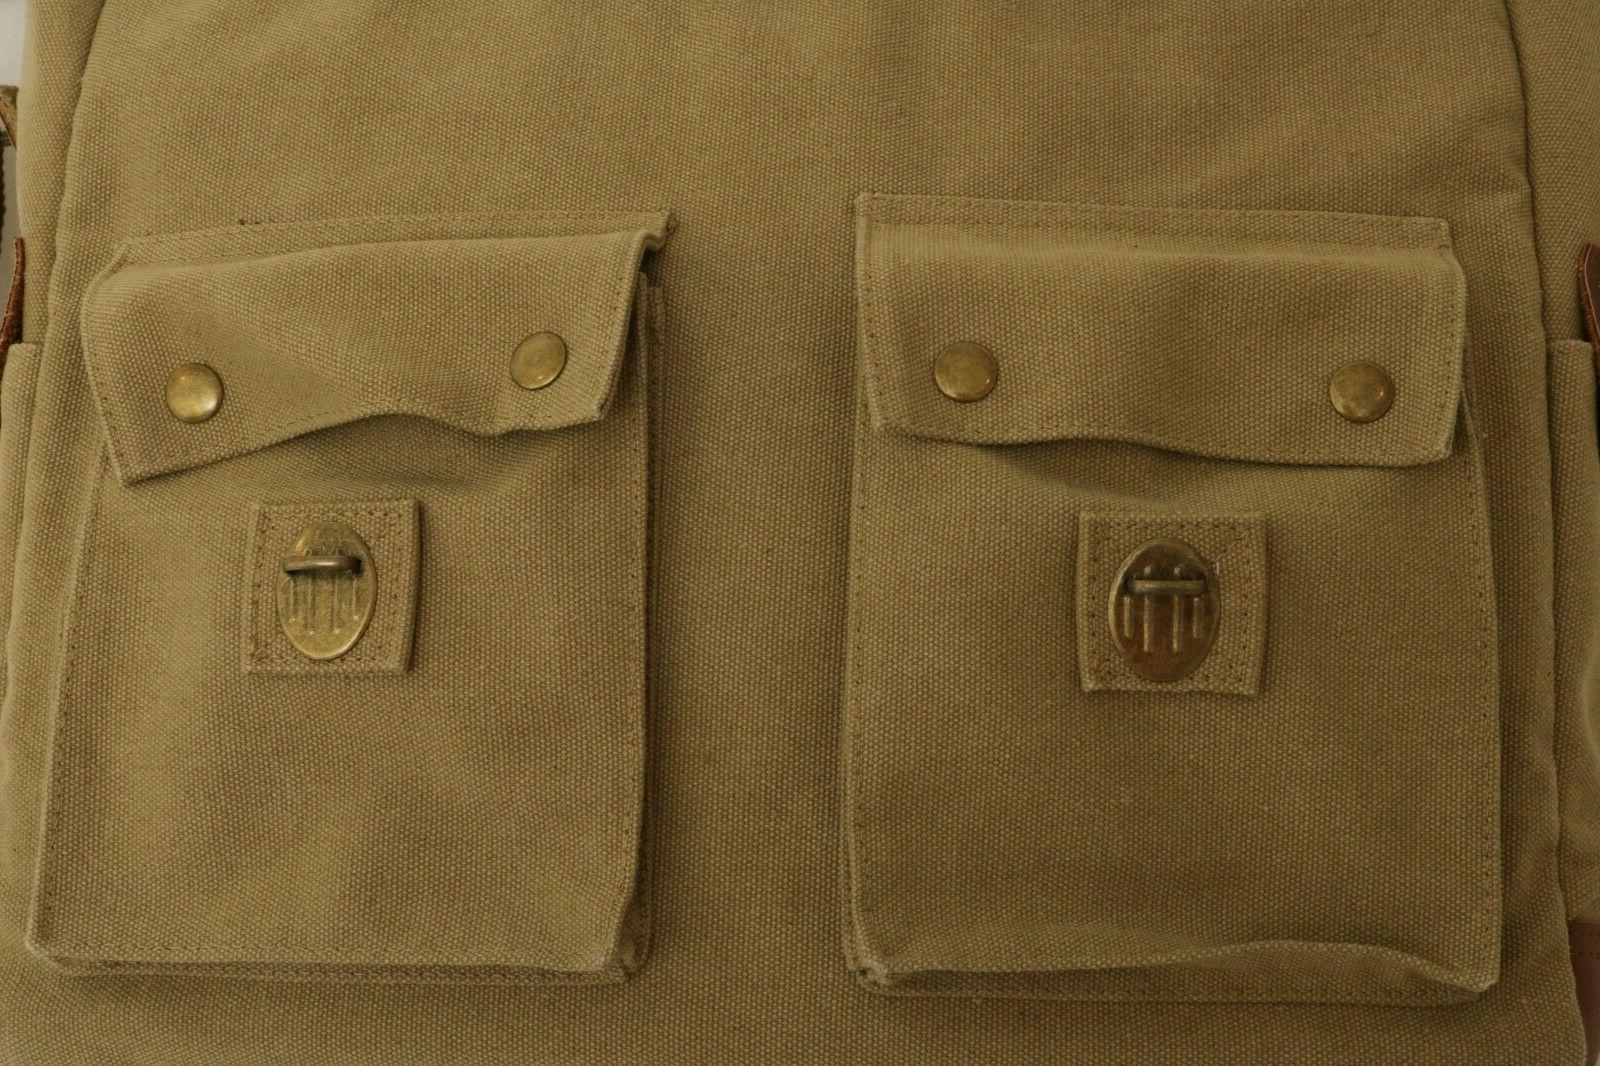 Sweetbriar Canvas Business Casual Shoulder Messenger Bag